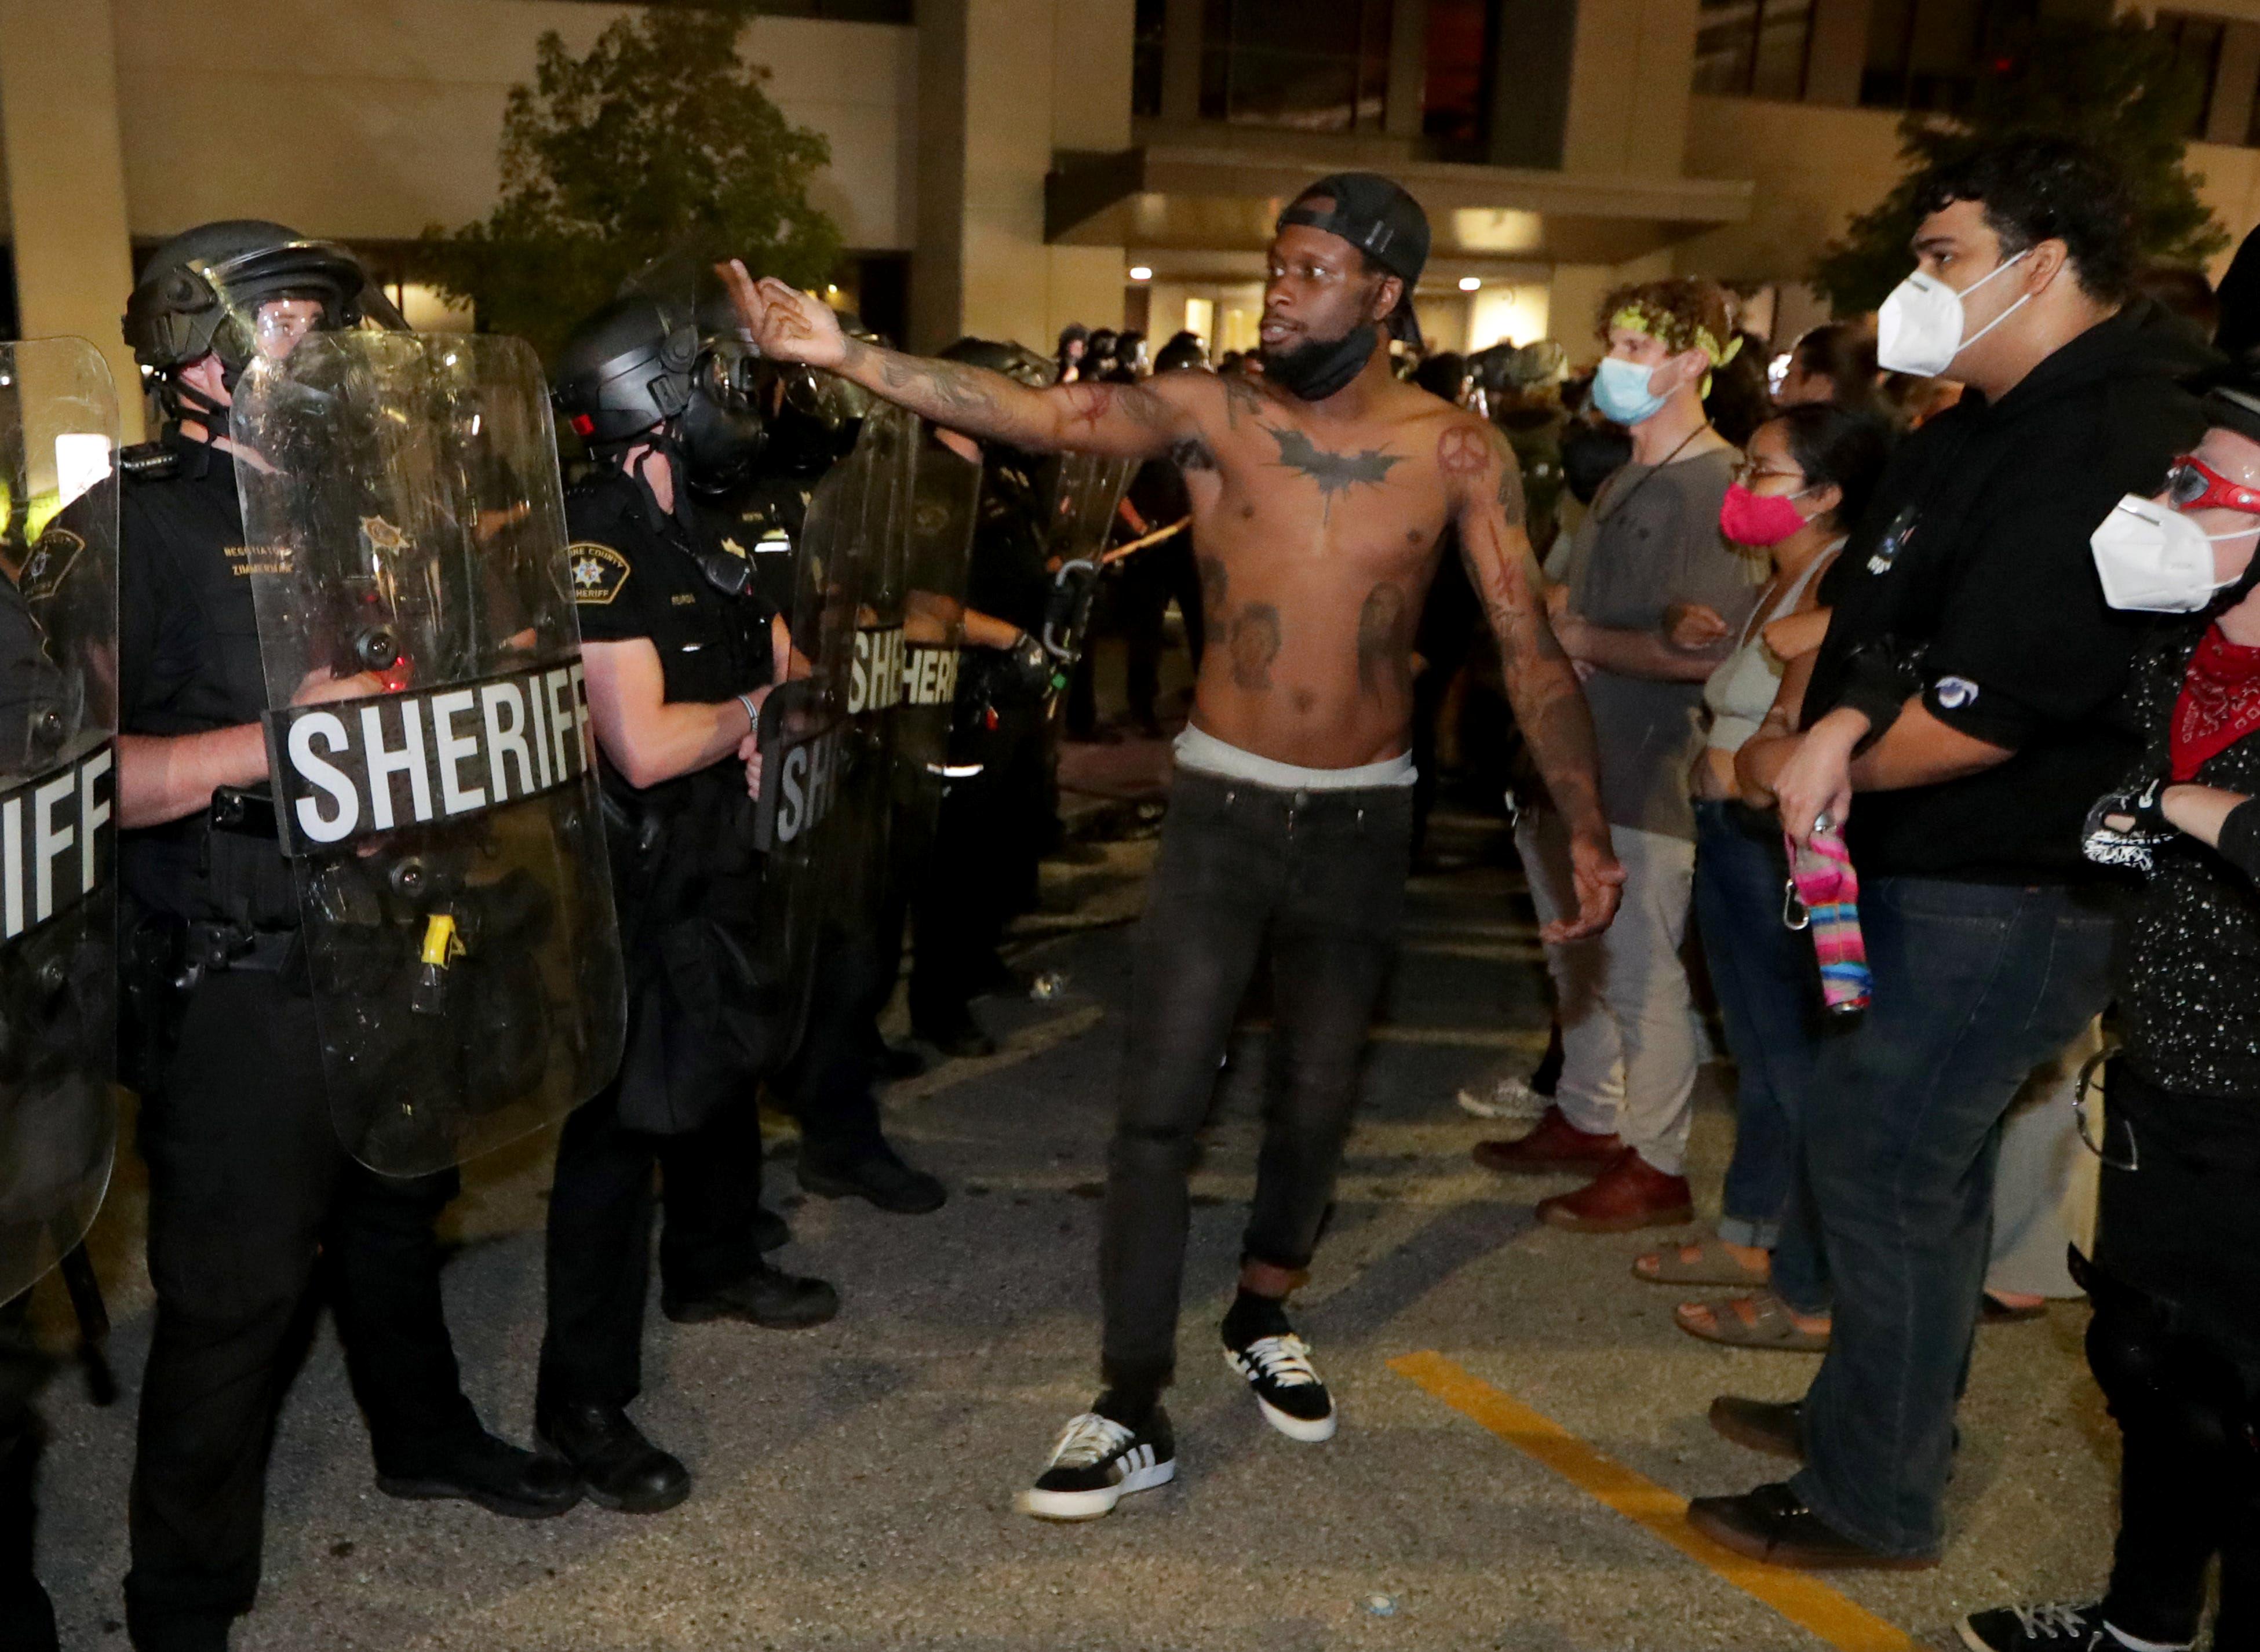 Un hombre se enfrenta a la policía frente al departamento de policía en de Kenosha (Mike De Sisti/Milwaukee Journal Sentinel via USA TODAY via REUTERS)